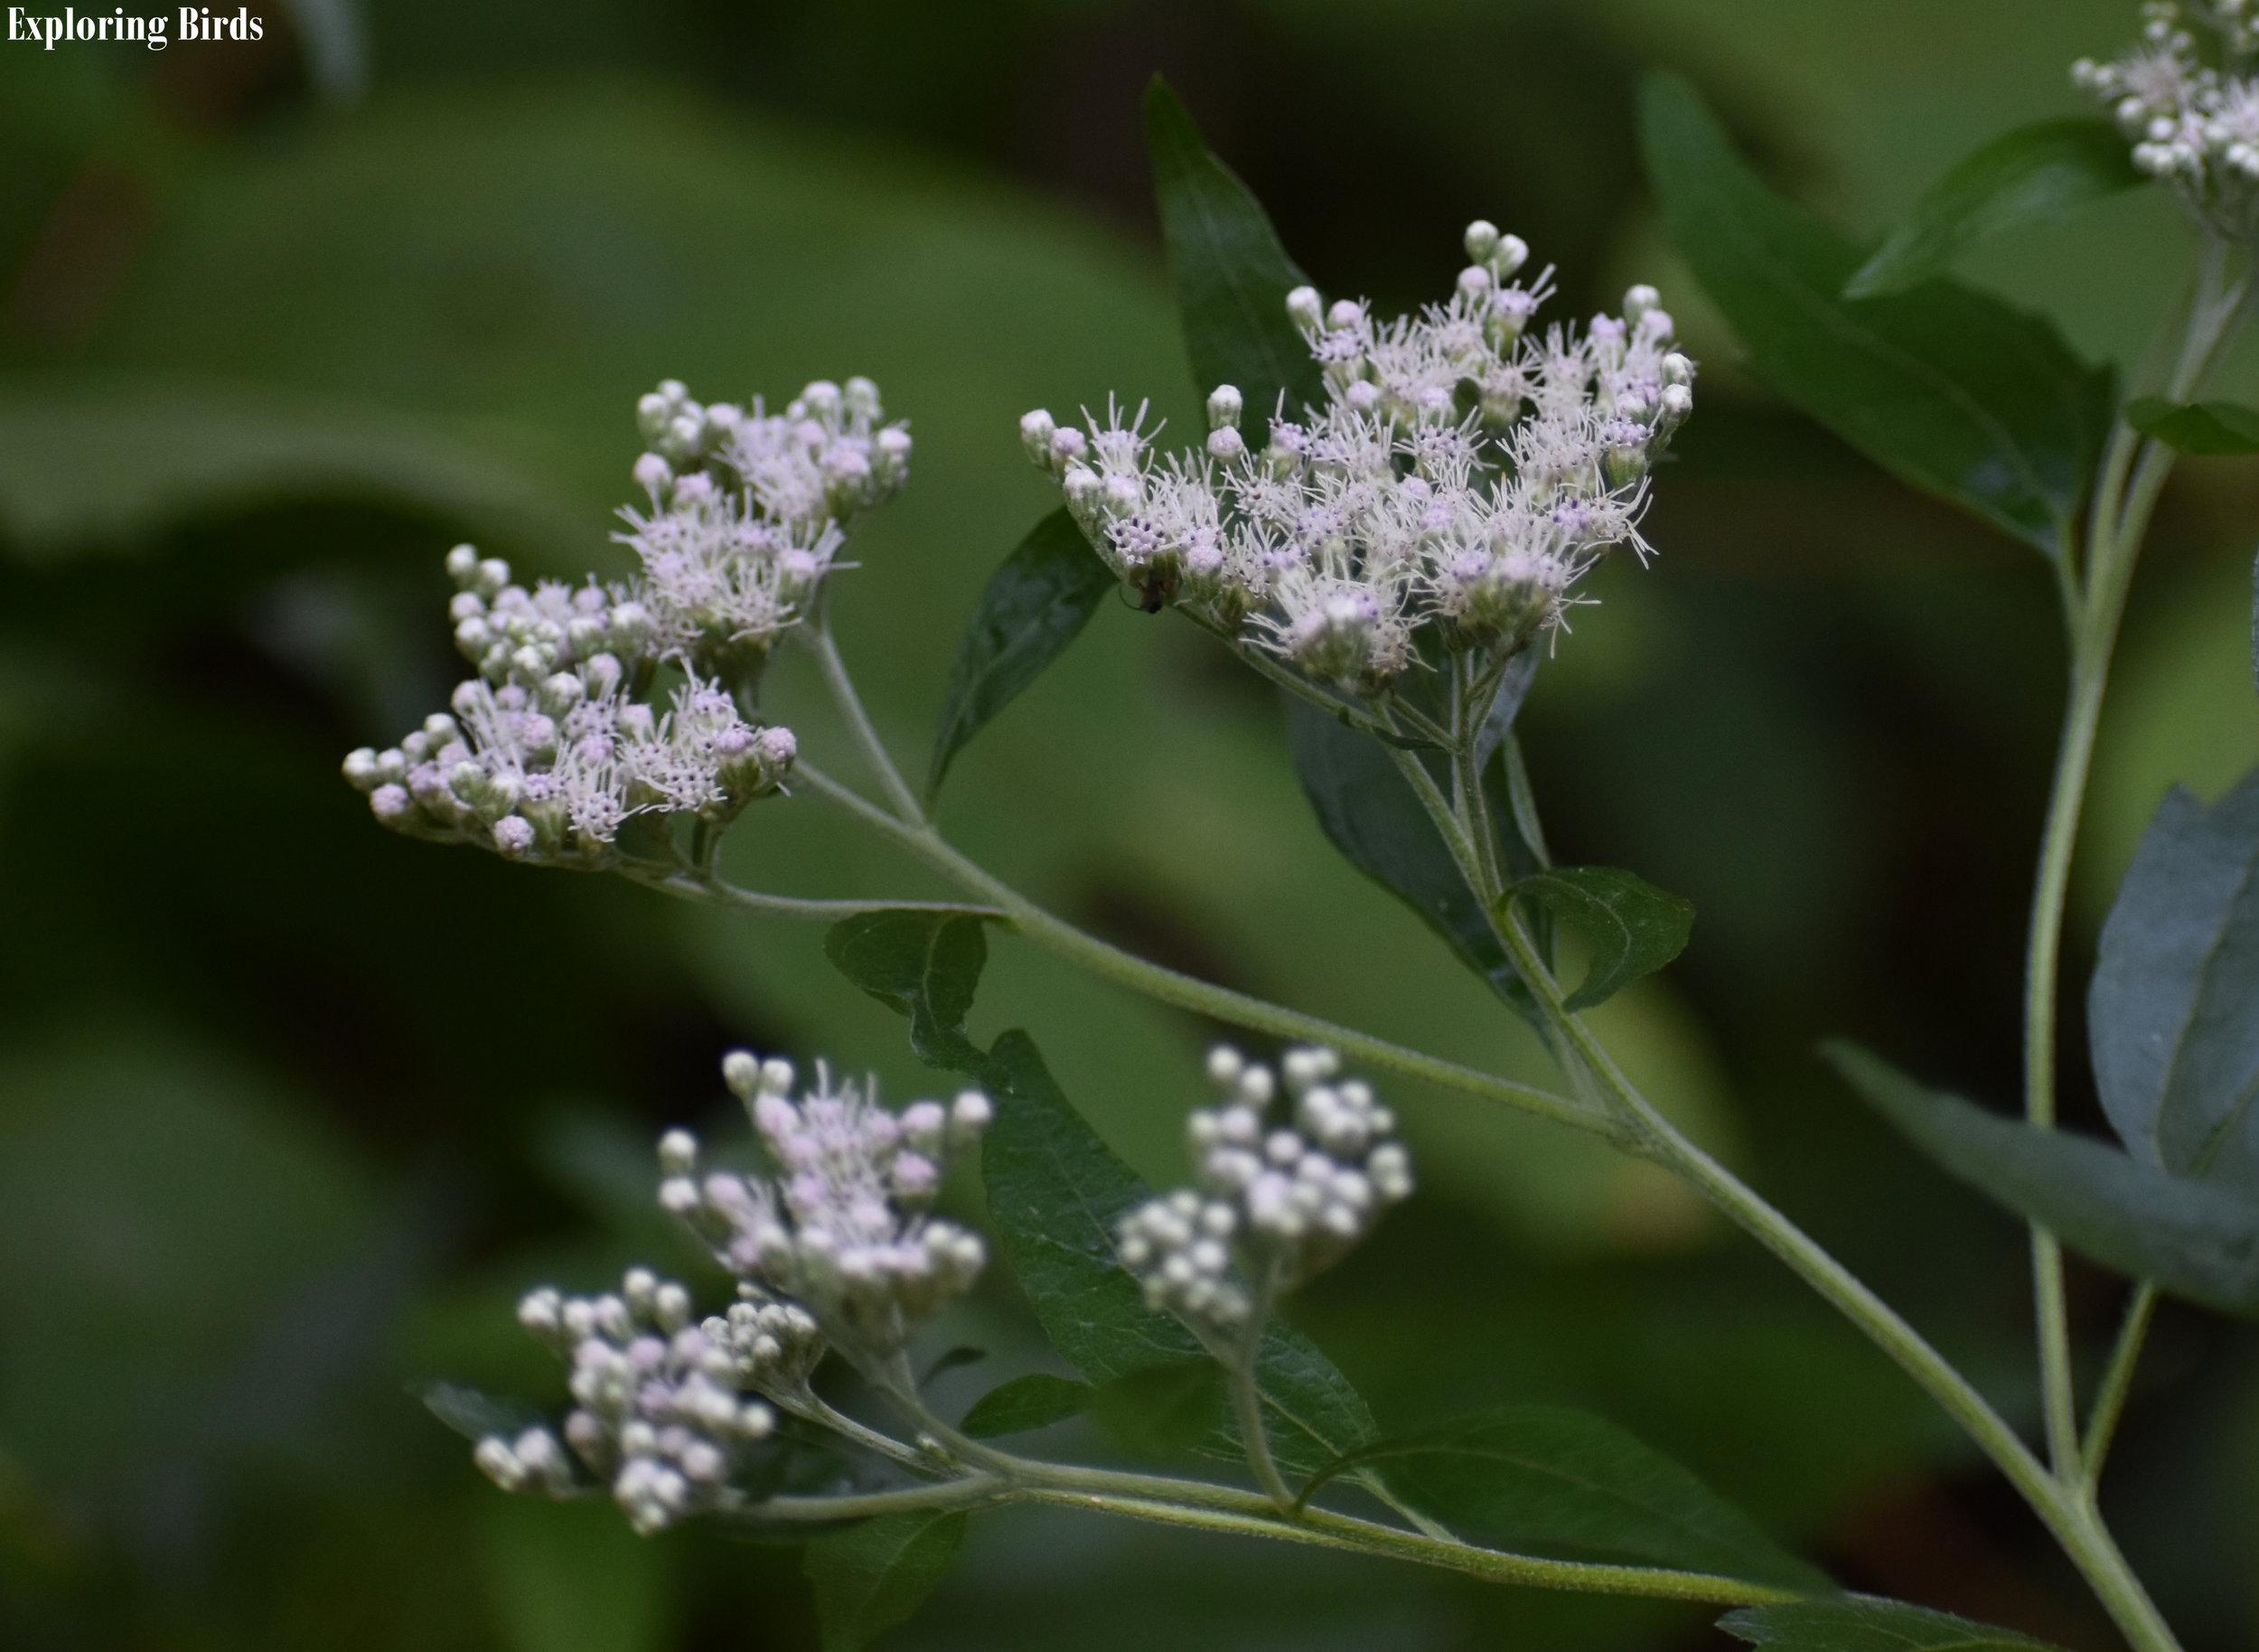 American Boneset is a flower that attracts birds